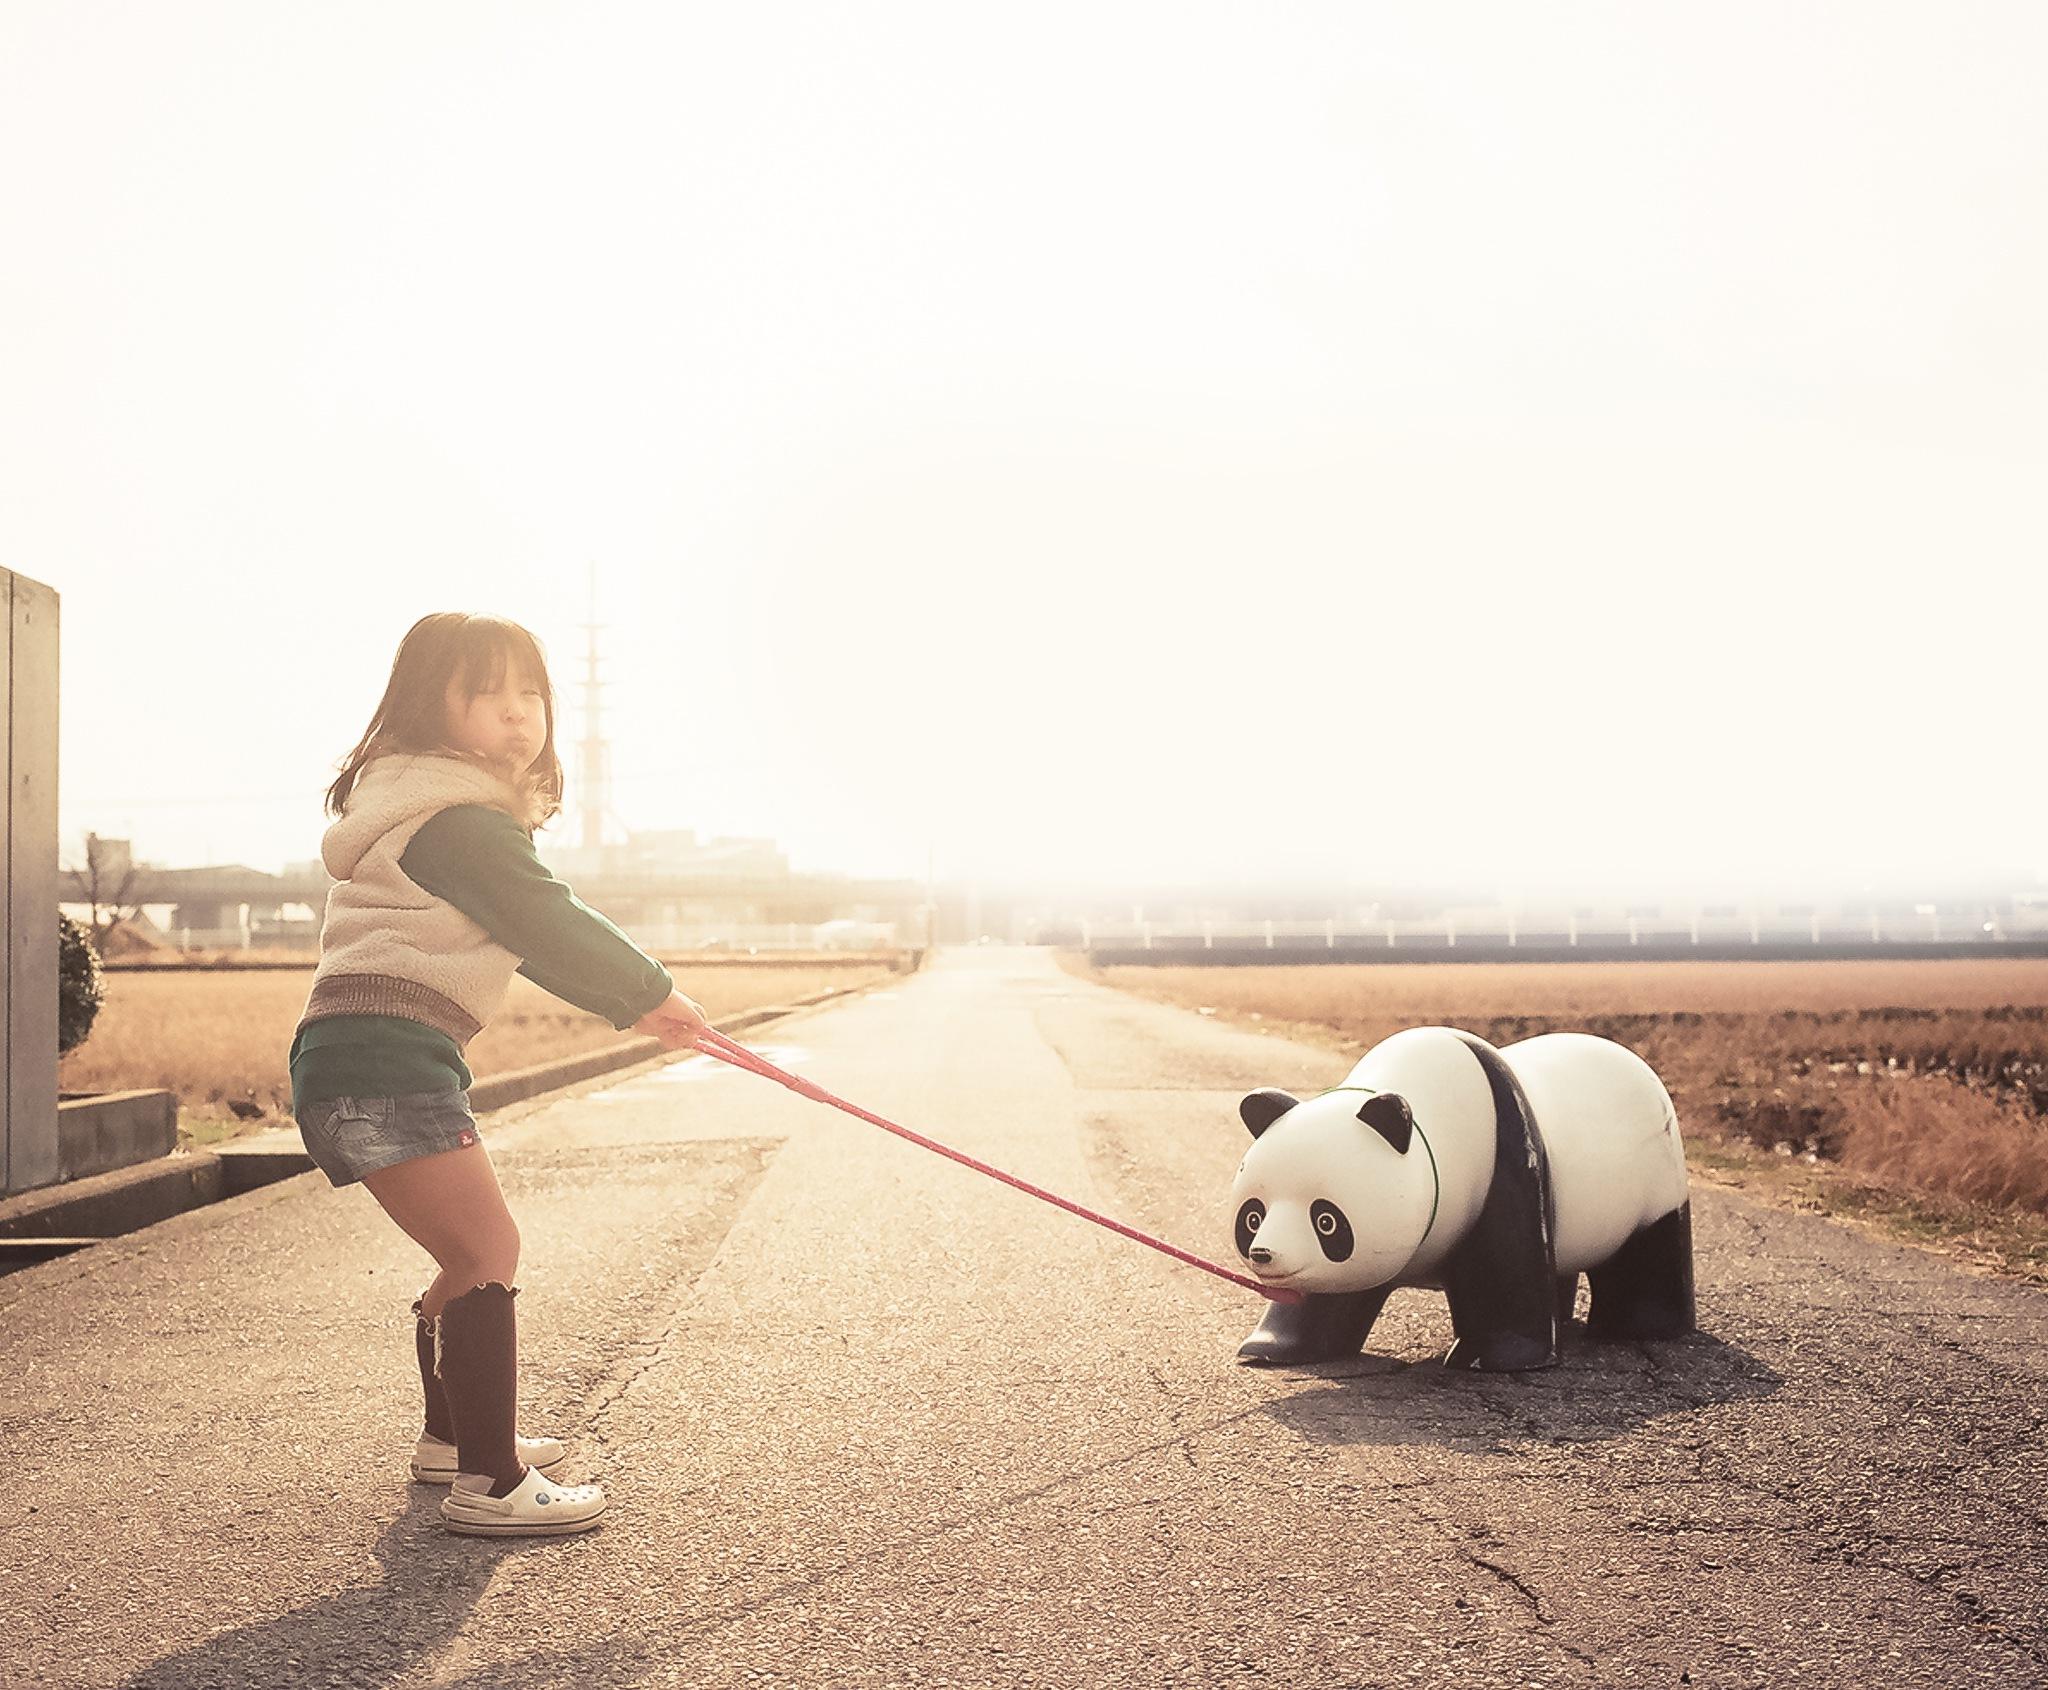 https://combo.staticflickr.com/ap/build/images/Panda_XL.jpg